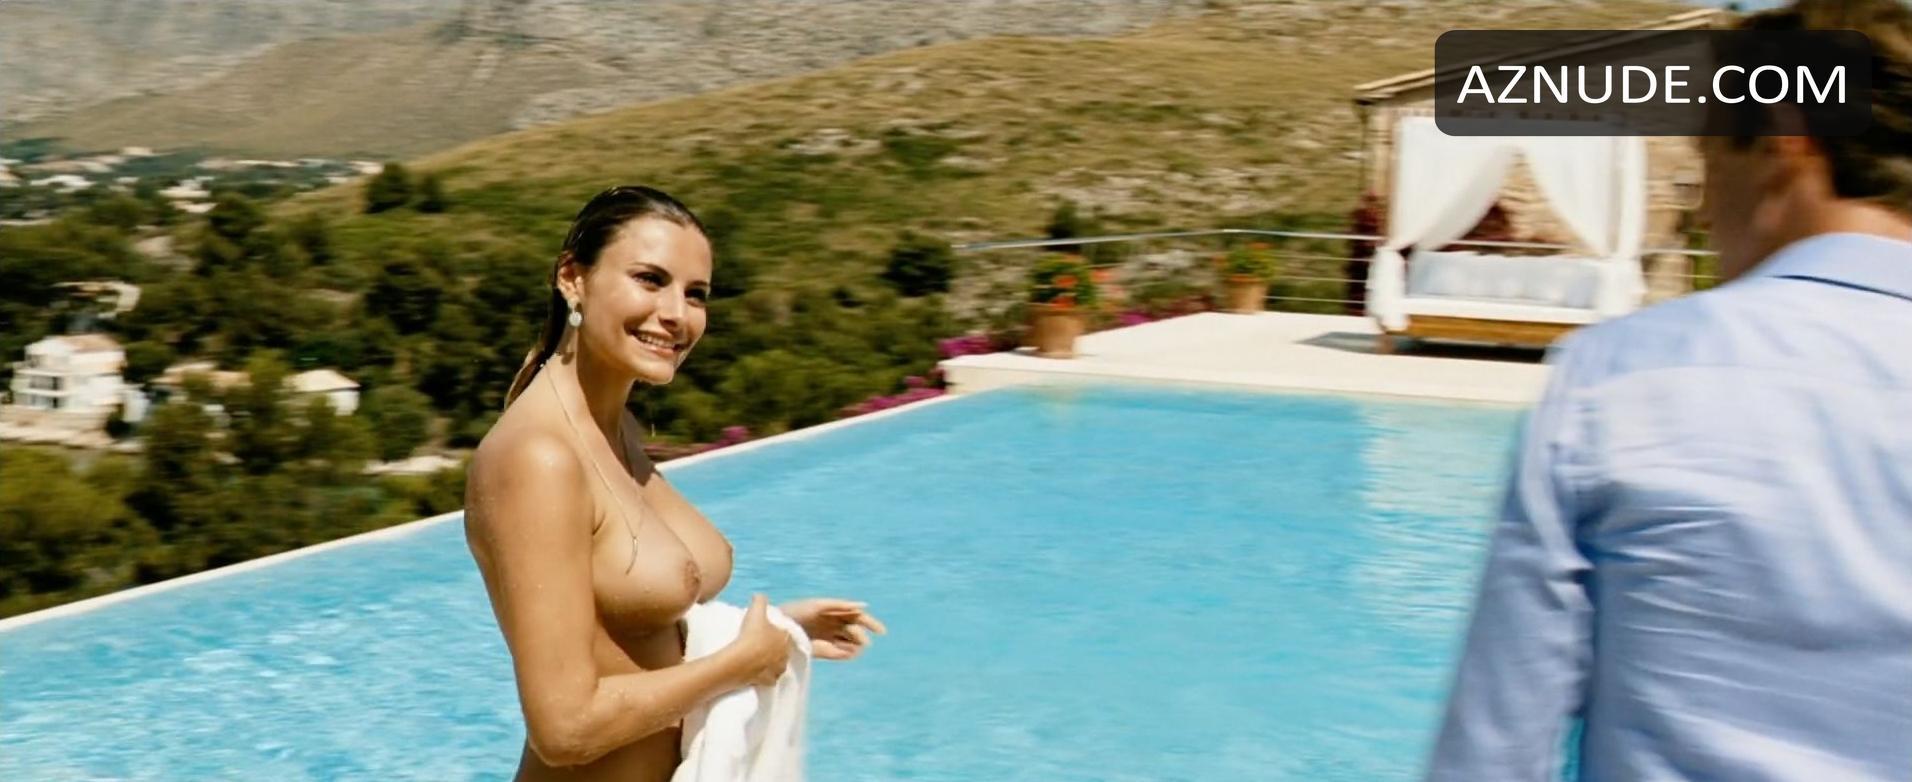 Roxanna June Nude Photos and Videos,IMGUR Amanda Carrier Hot pics Emma roberts scream queens sexy,Freida Pinto Nude